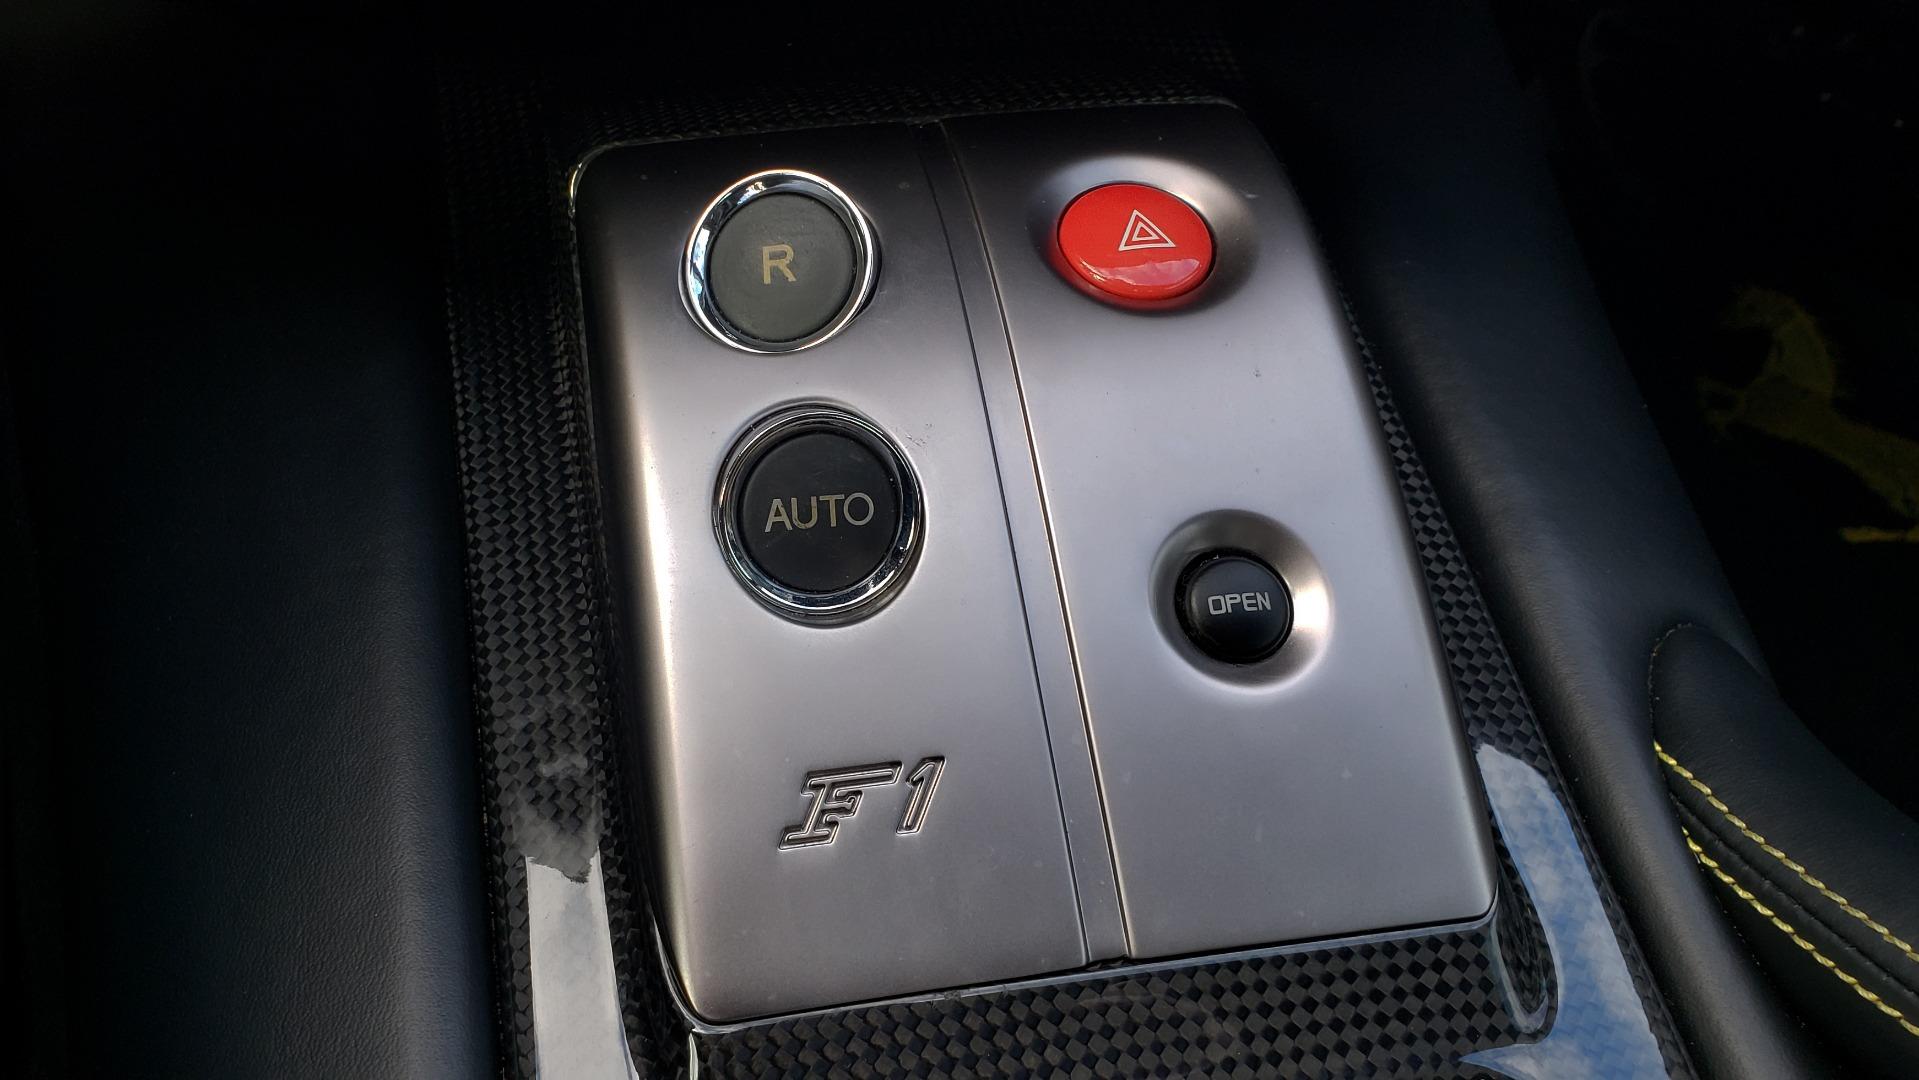 Used 2007 Ferrari 599 GTB FIORANO HGTE / V12 / F1 TRANS / NAV / BOSE / CUSTOM WHEELS for sale $109,999 at Formula Imports in Charlotte NC 28227 76